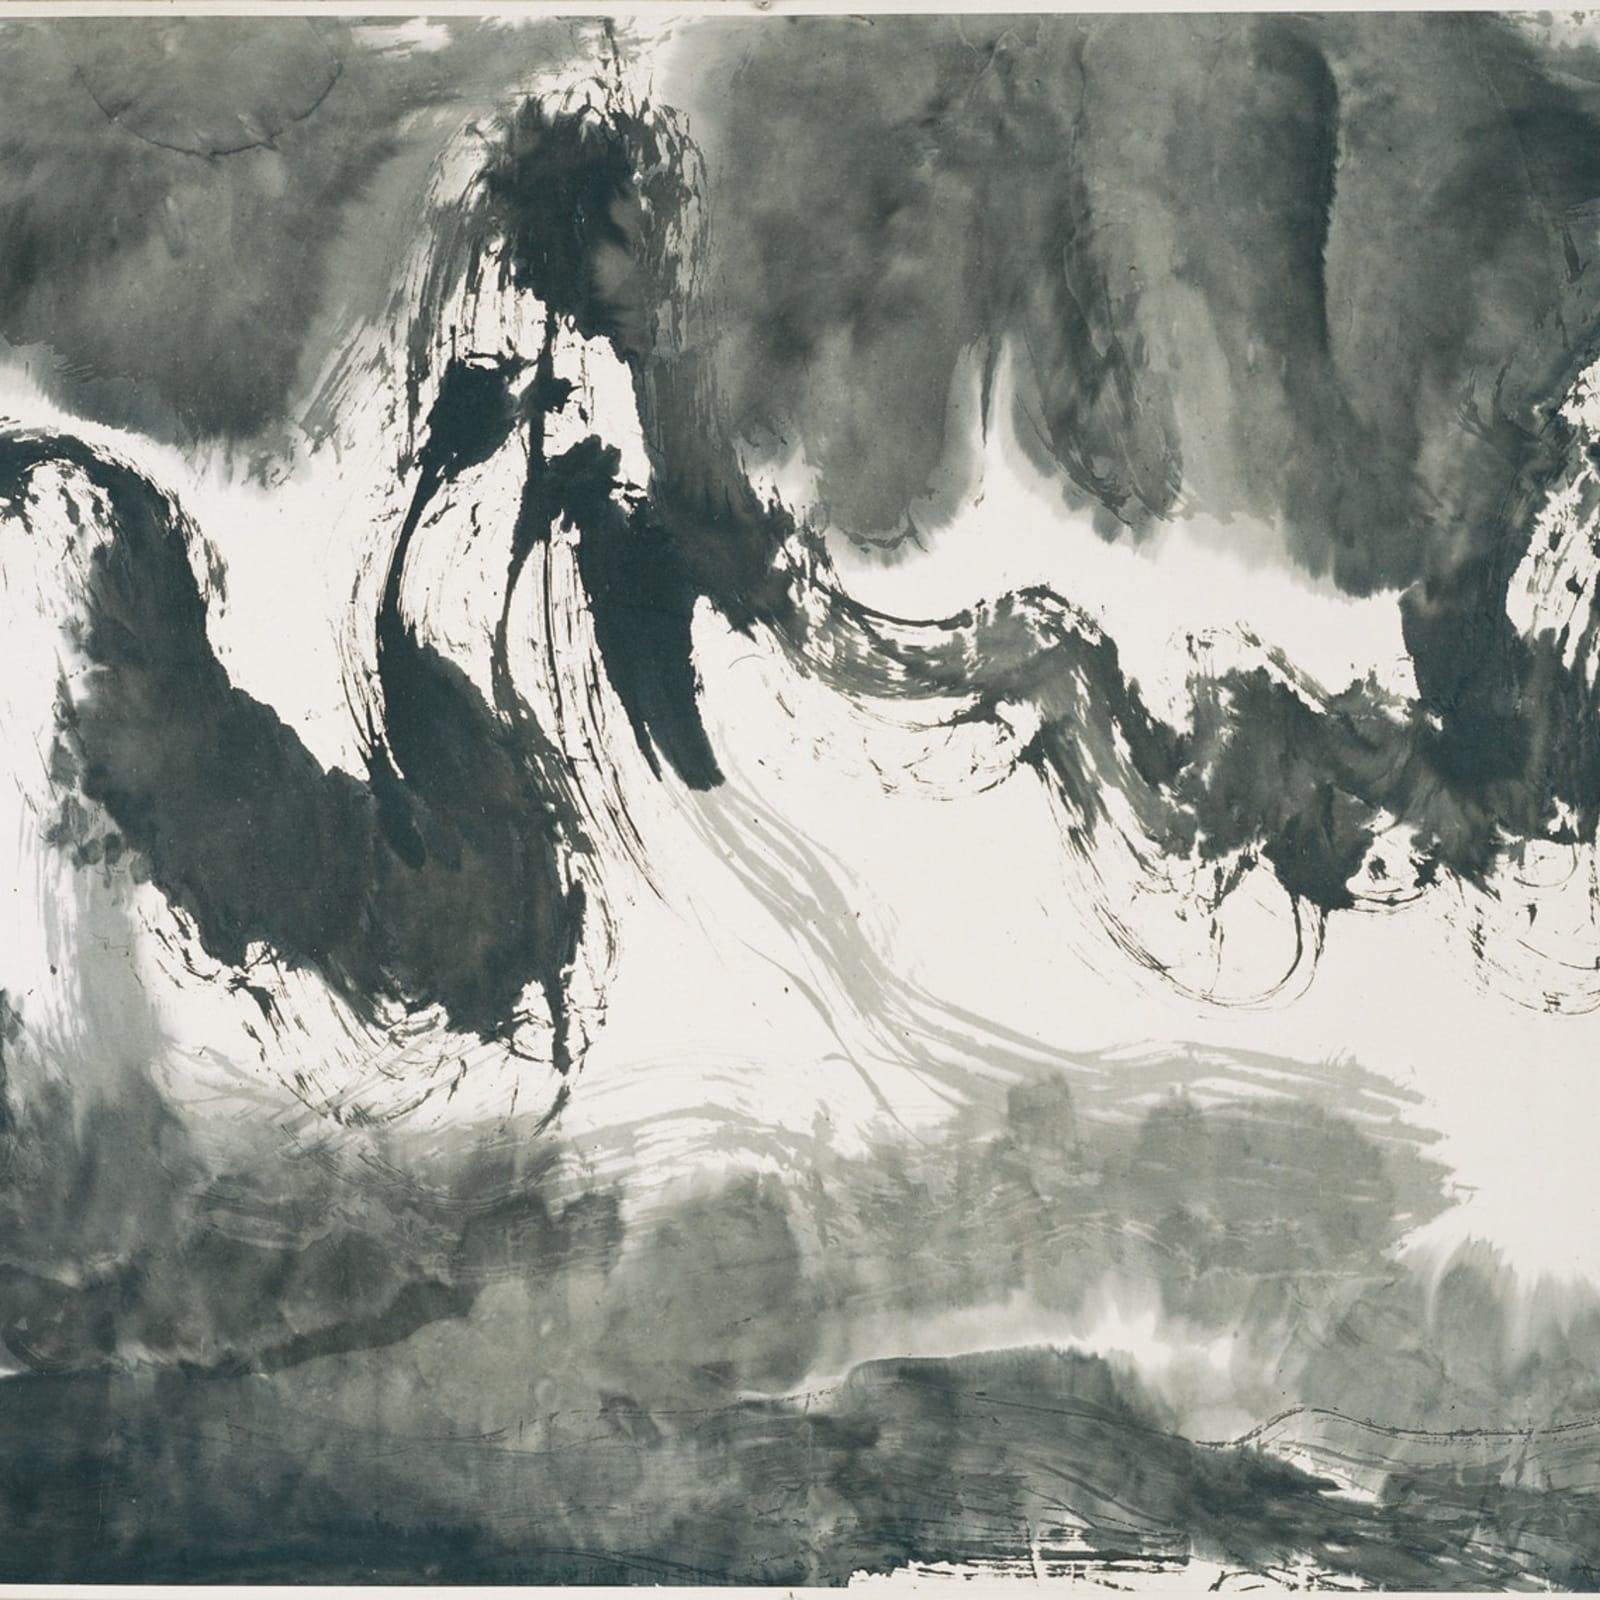 Li Huasheng 李华生, 0112, 2001